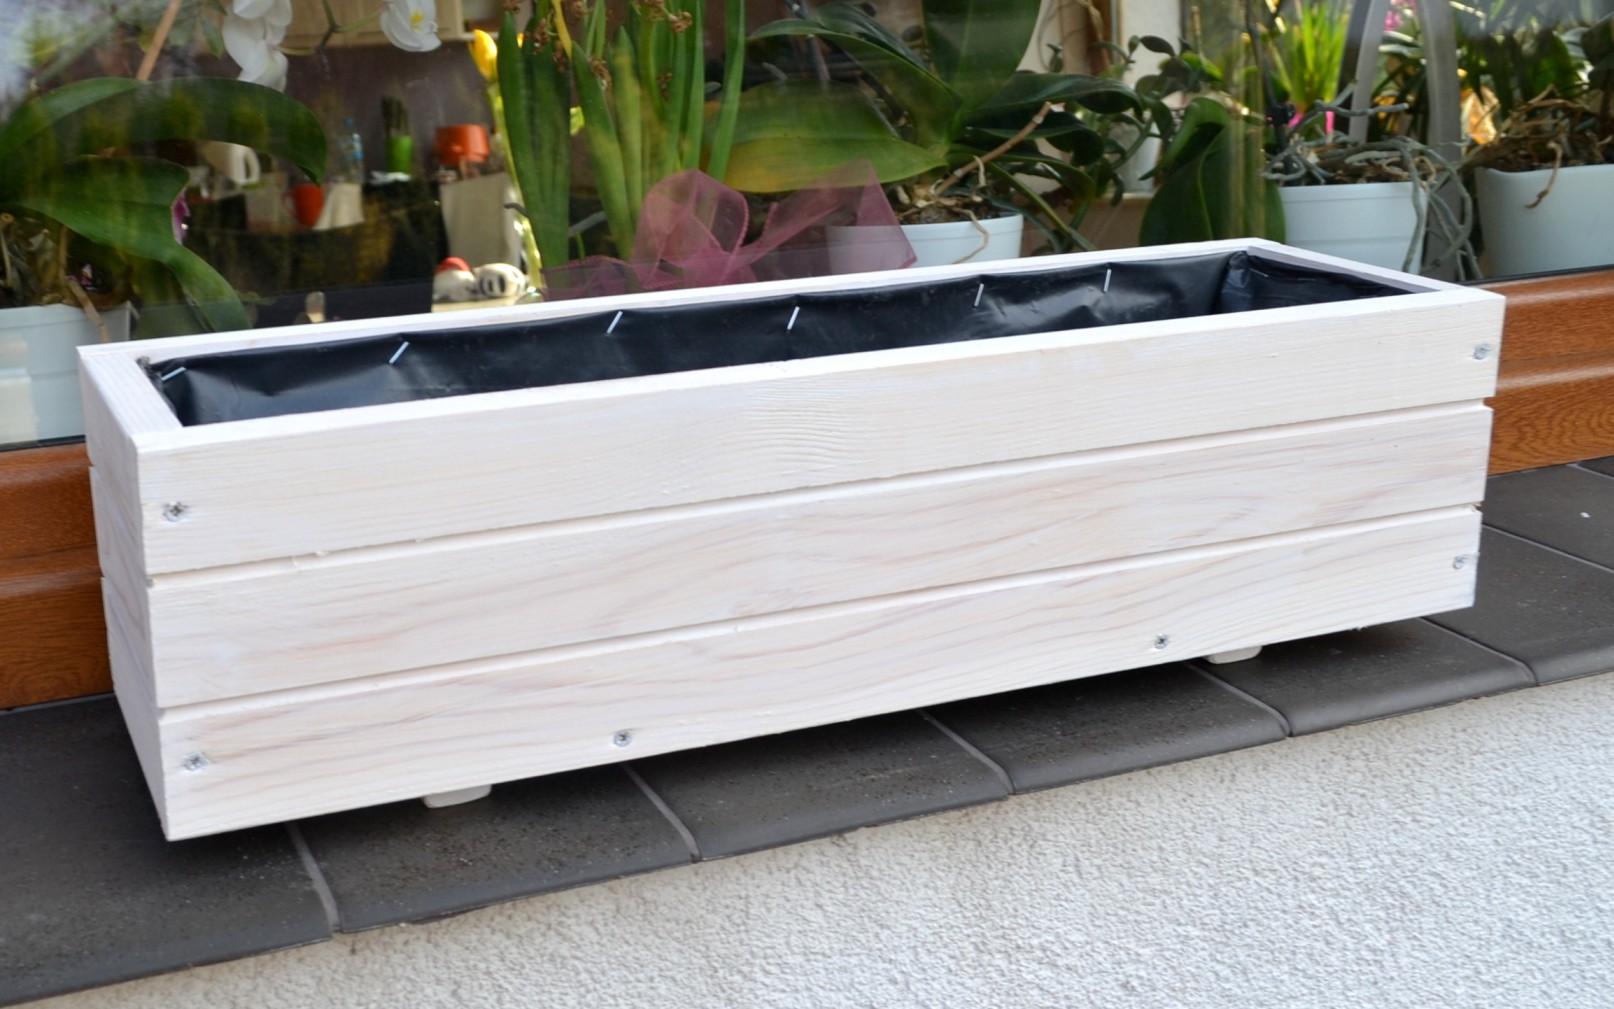 pflanzkasten holz pflanzk bel garten blumenkasten 60 90 cm. Black Bedroom Furniture Sets. Home Design Ideas